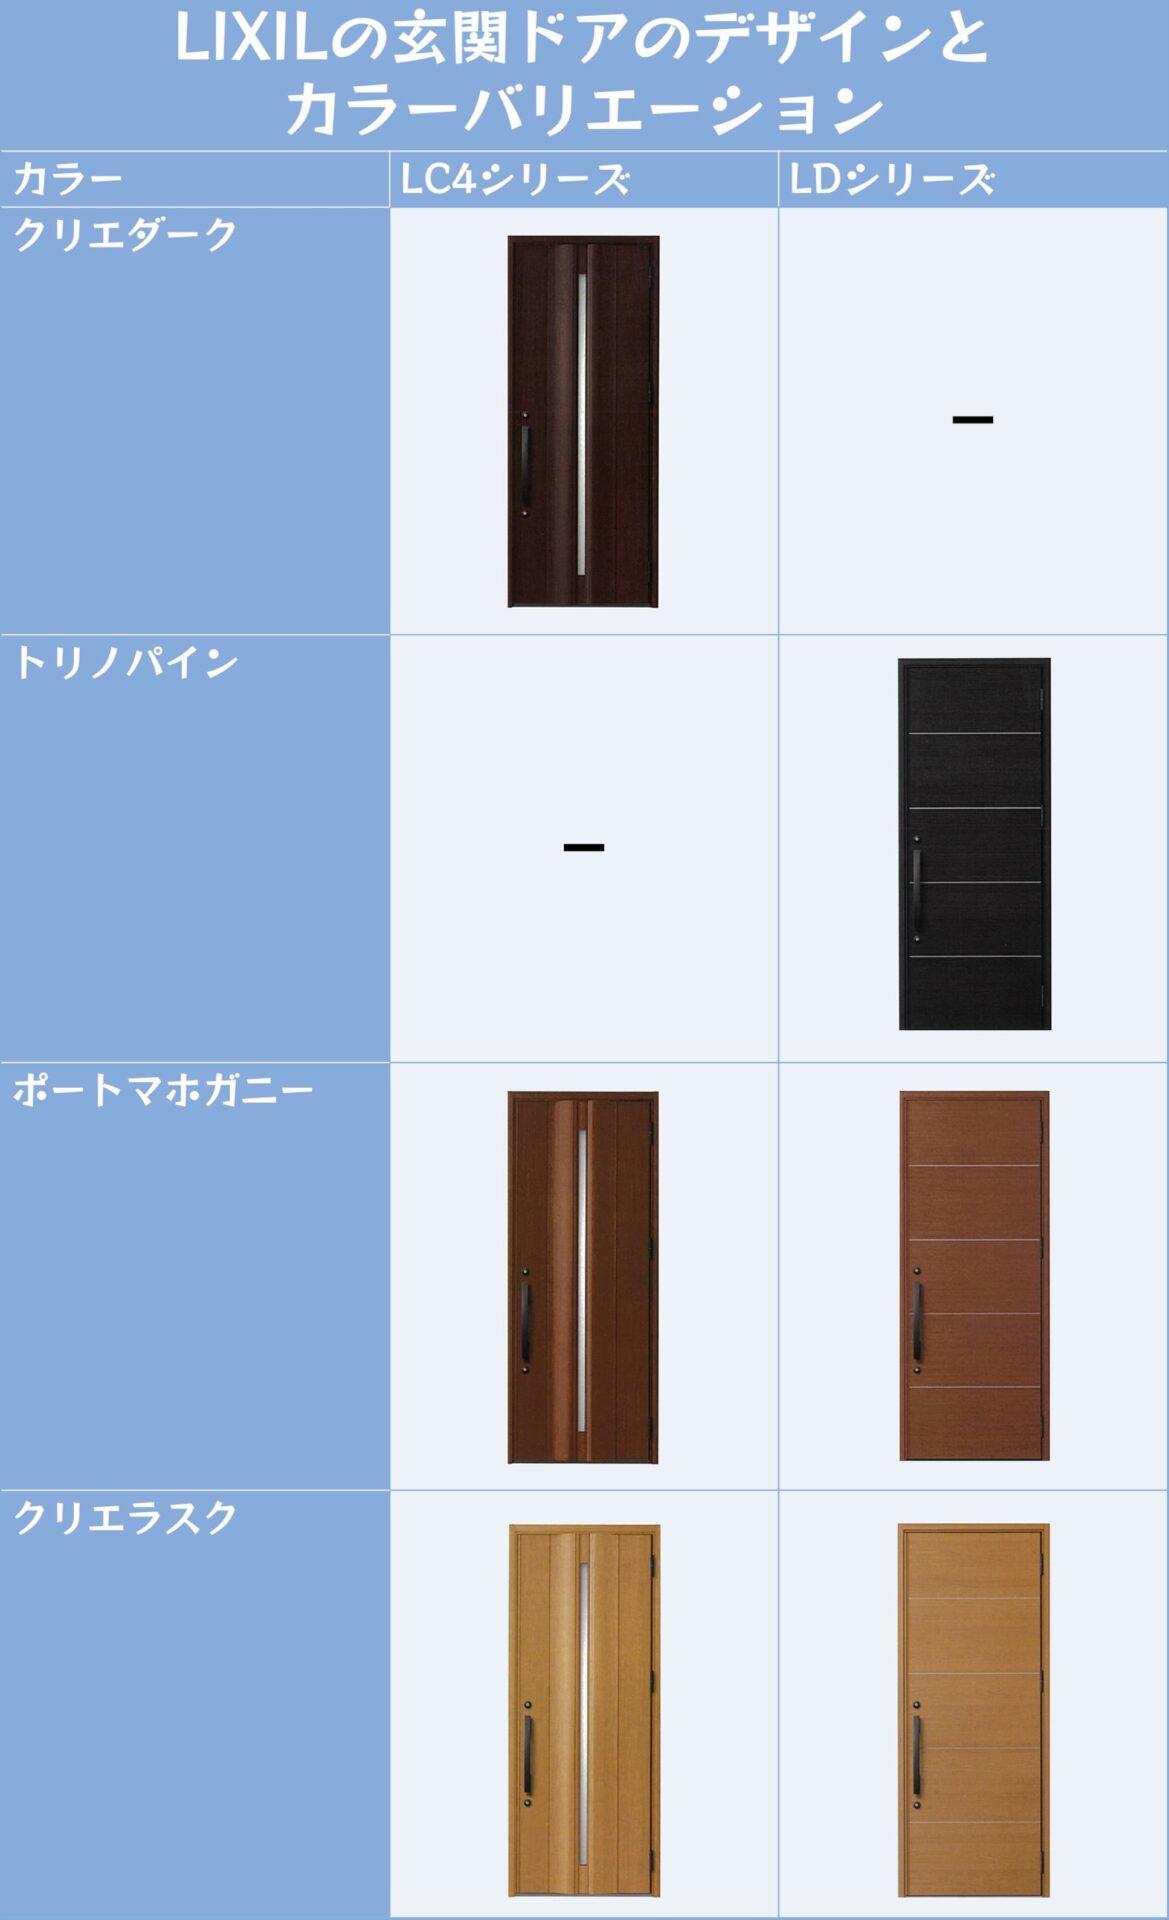 LIXILのデザインとカラーバリエーション